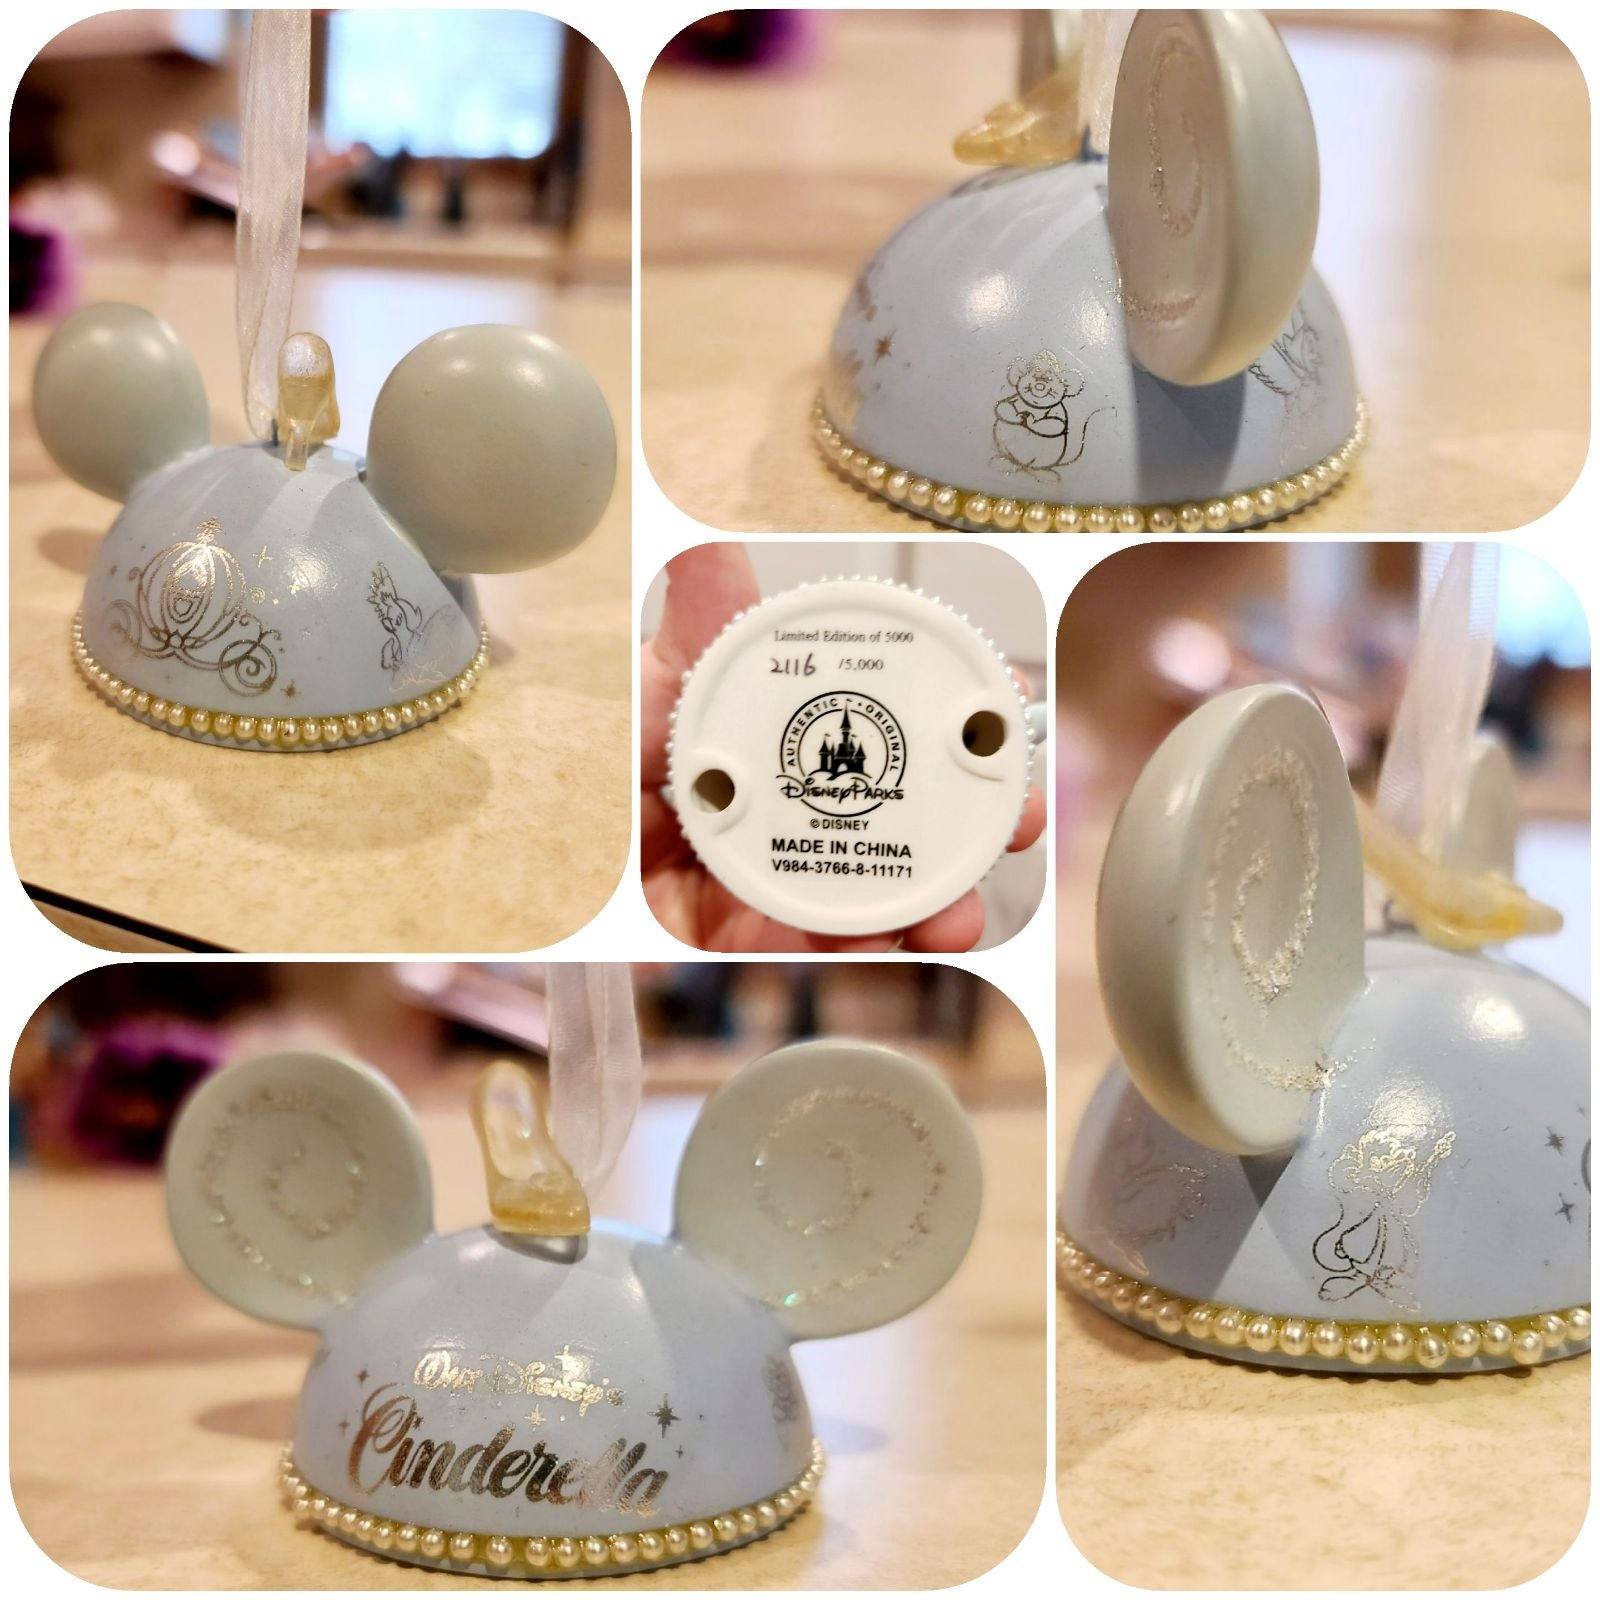 LE Disney Cinderella Slipper Ornament